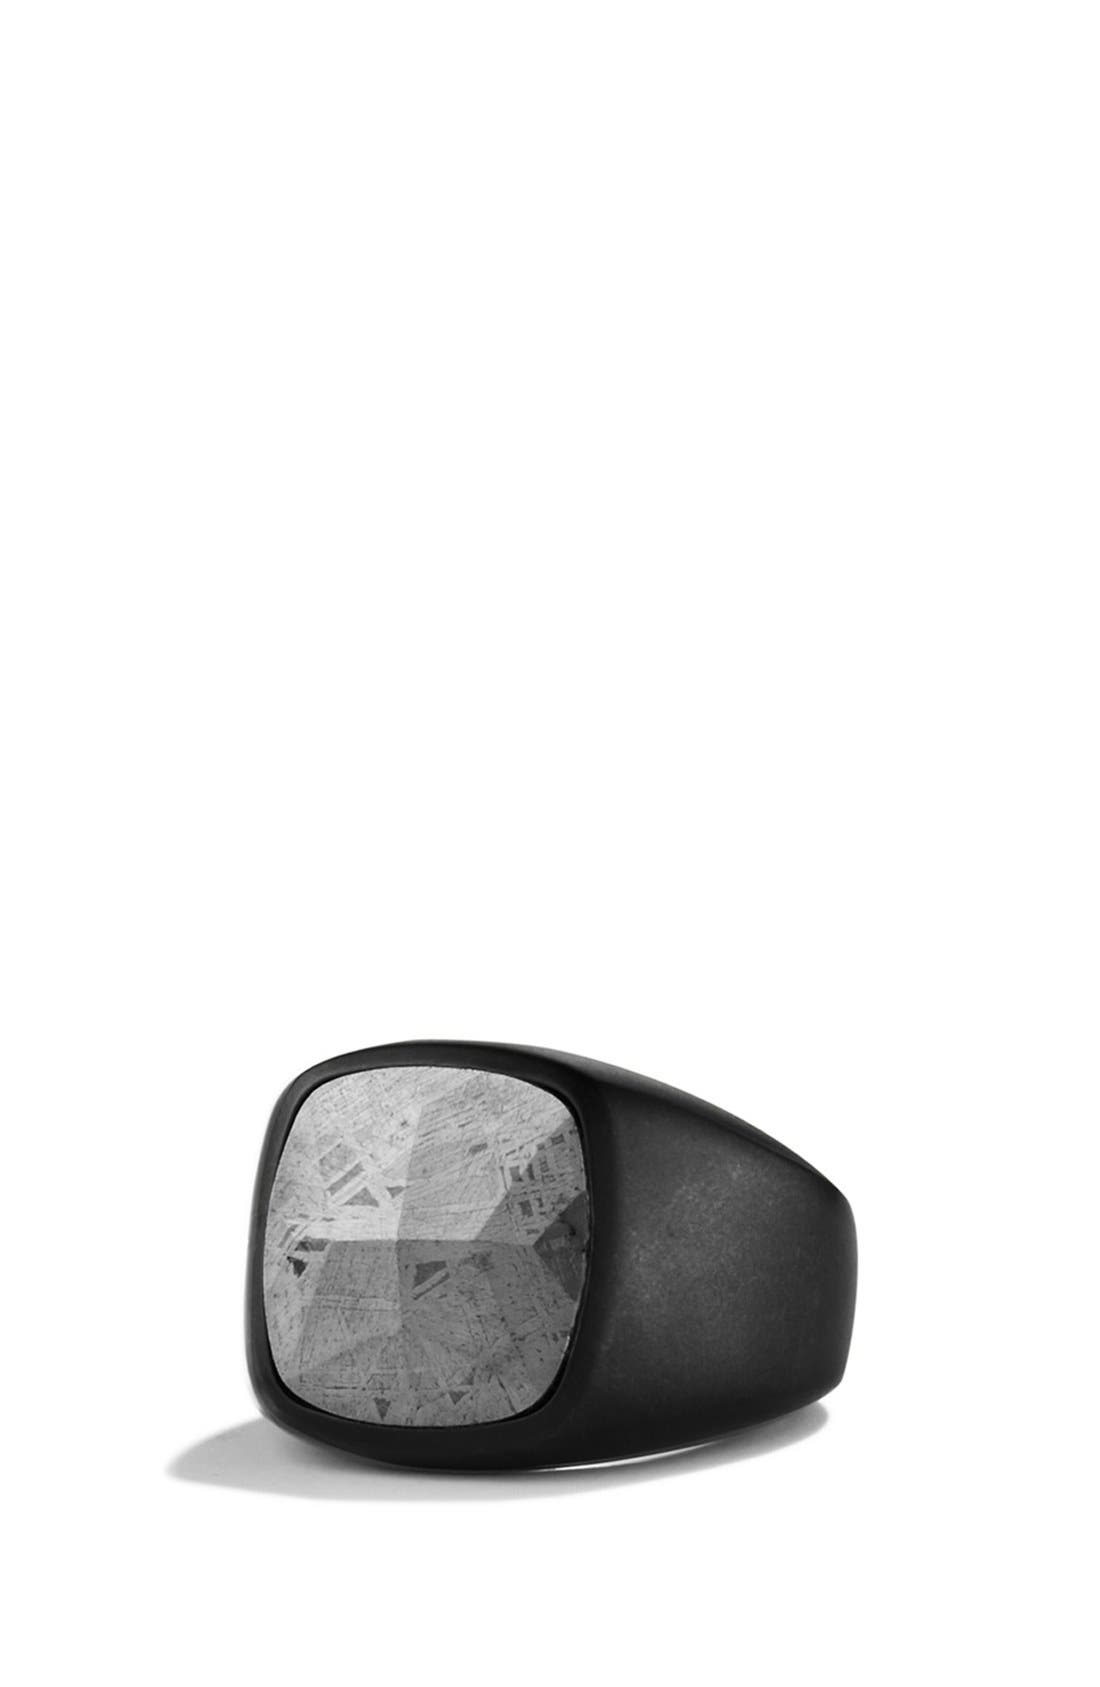 David Yurman 'Meteorite' Signet Ring in Black Titanium